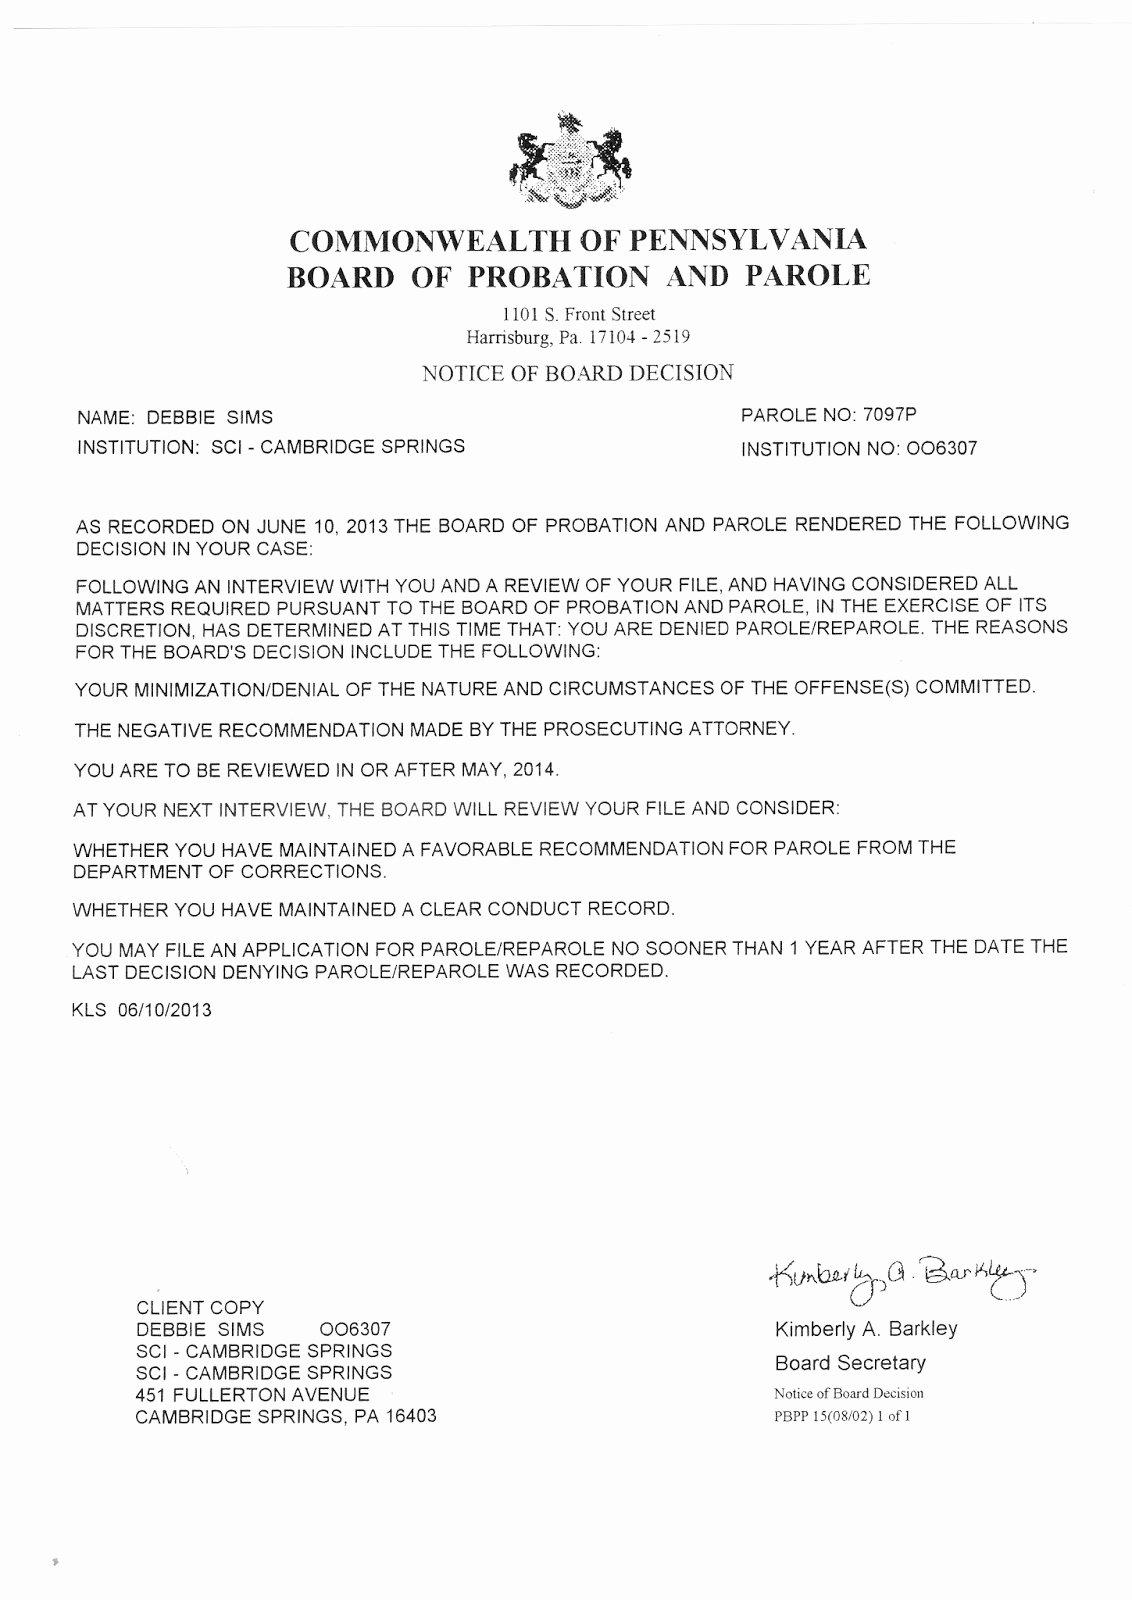 Letter Of Recommendation for Parole Beautiful Free the Move 9 Debbie S 2013 Parole Denial